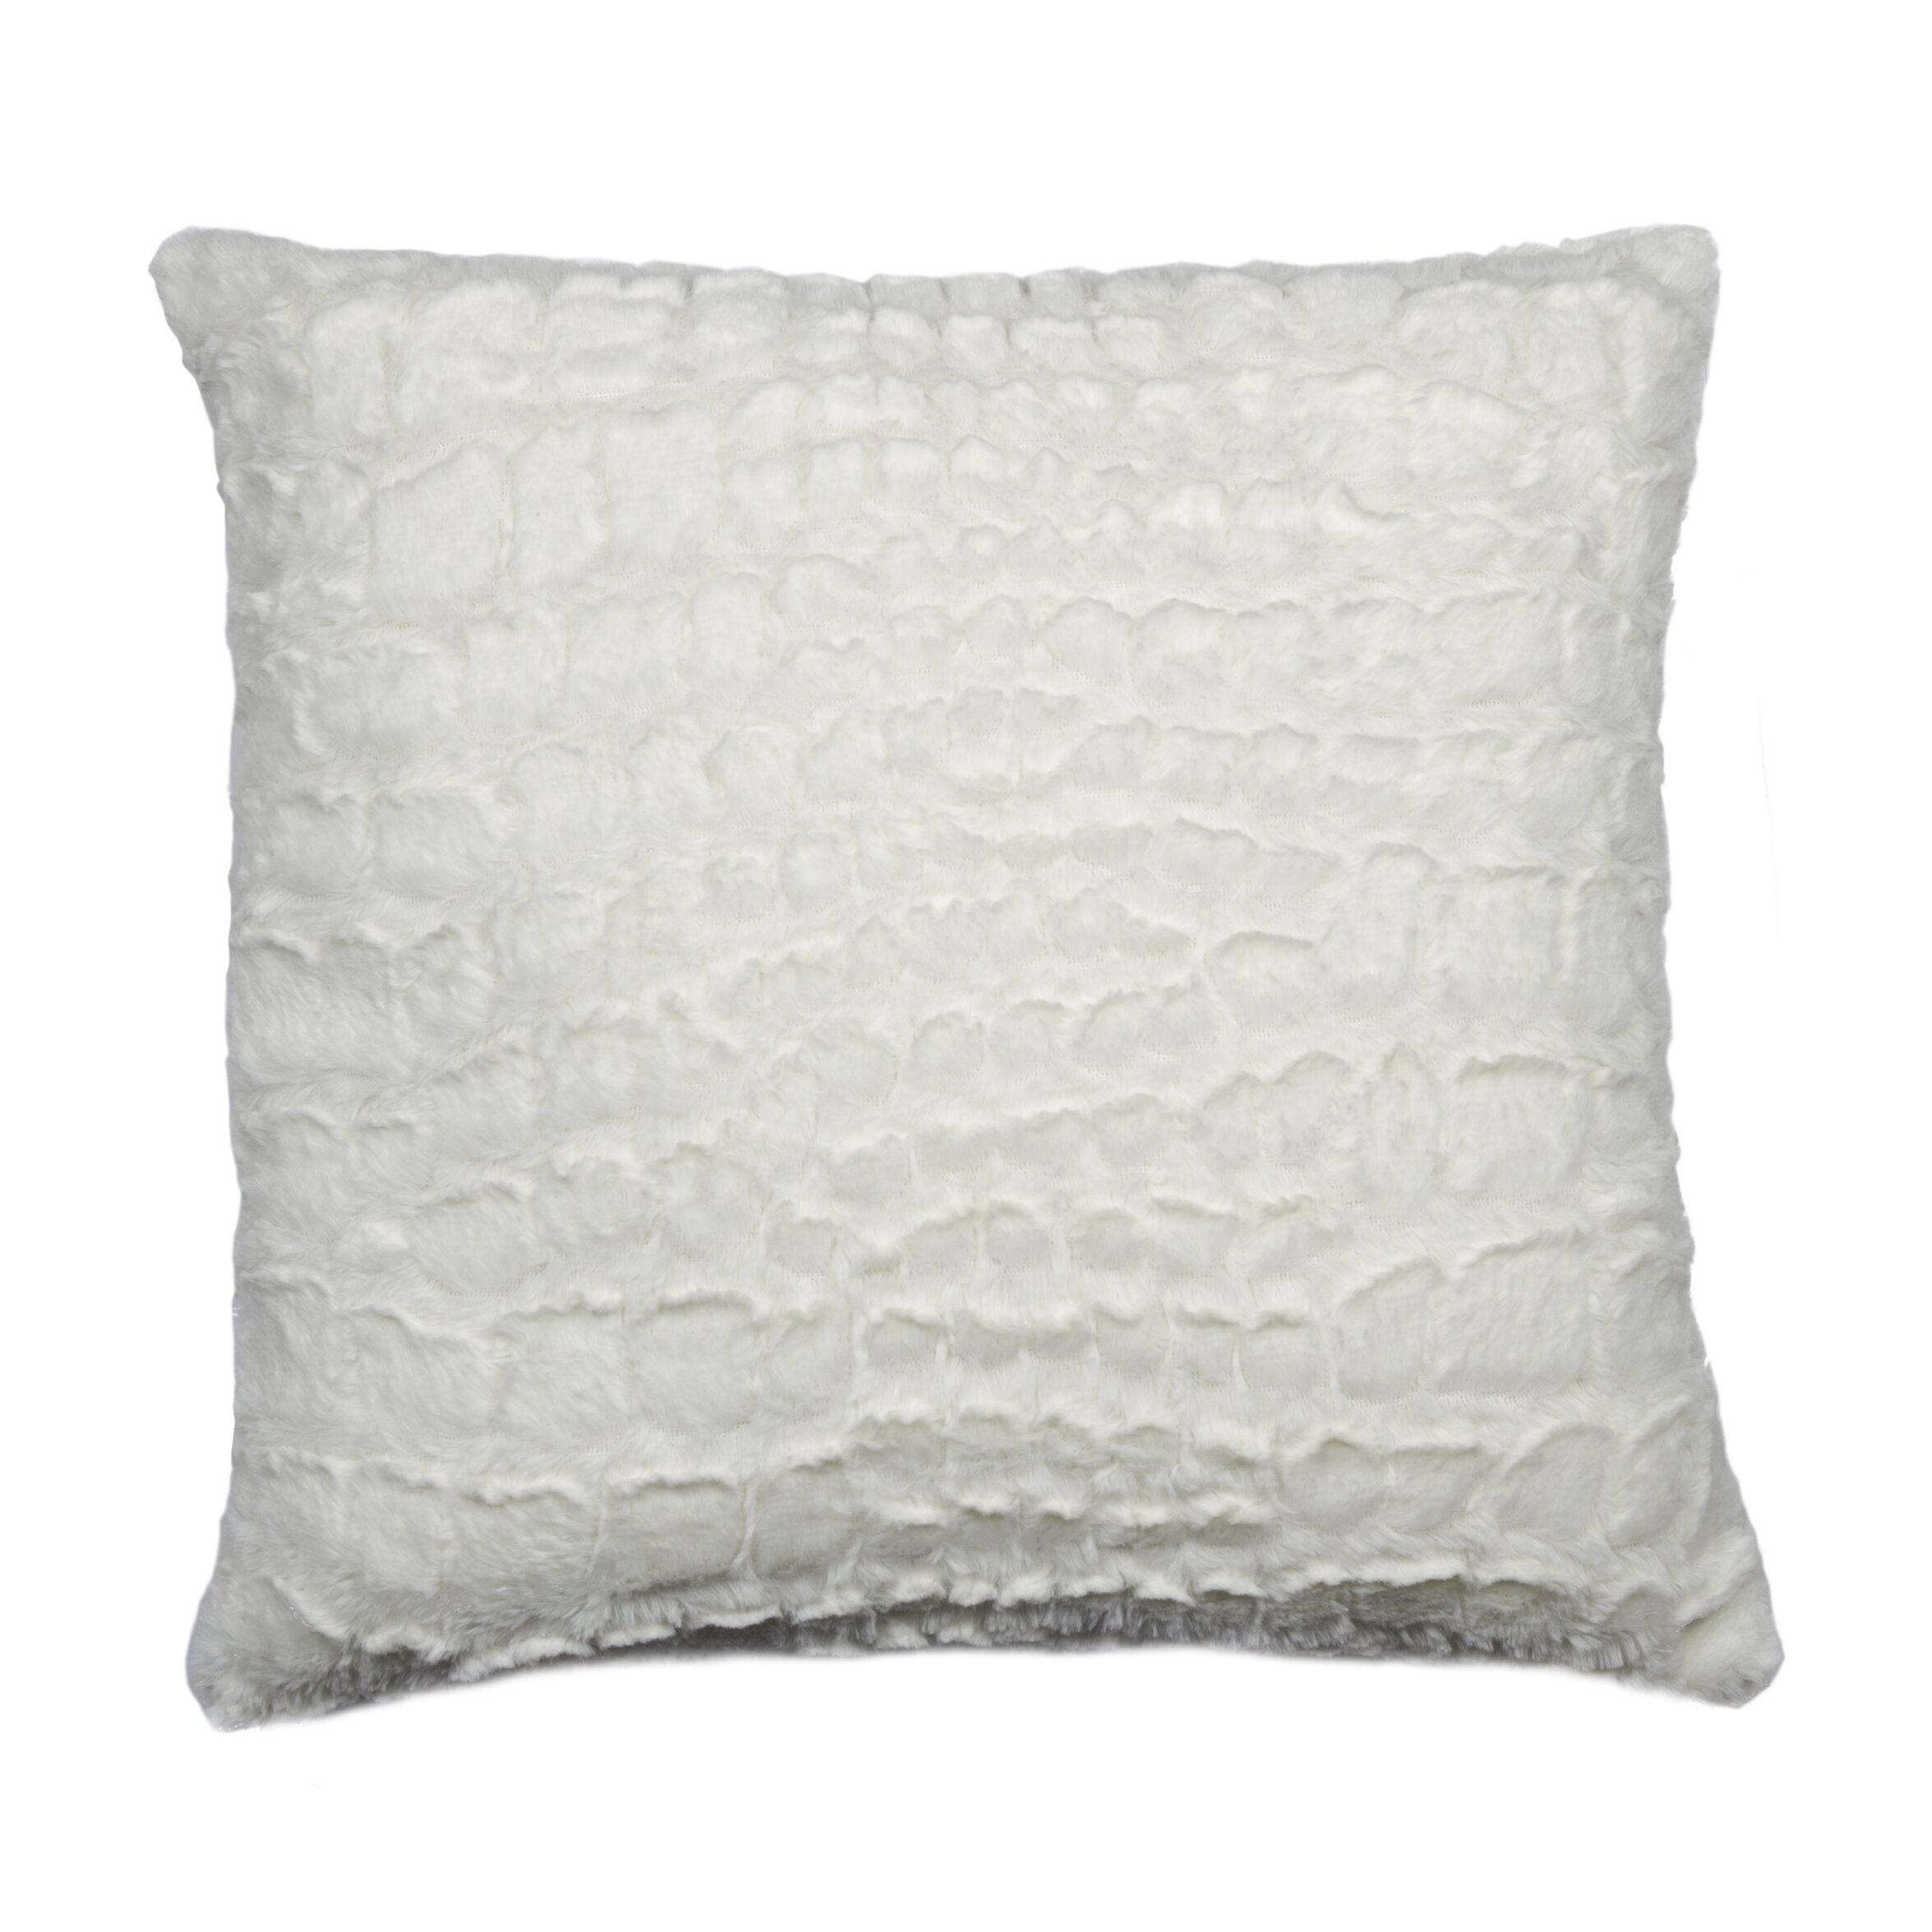 Luxe Belton Faux Fur Throw Pillow Amp Reviews Wayfair Ca